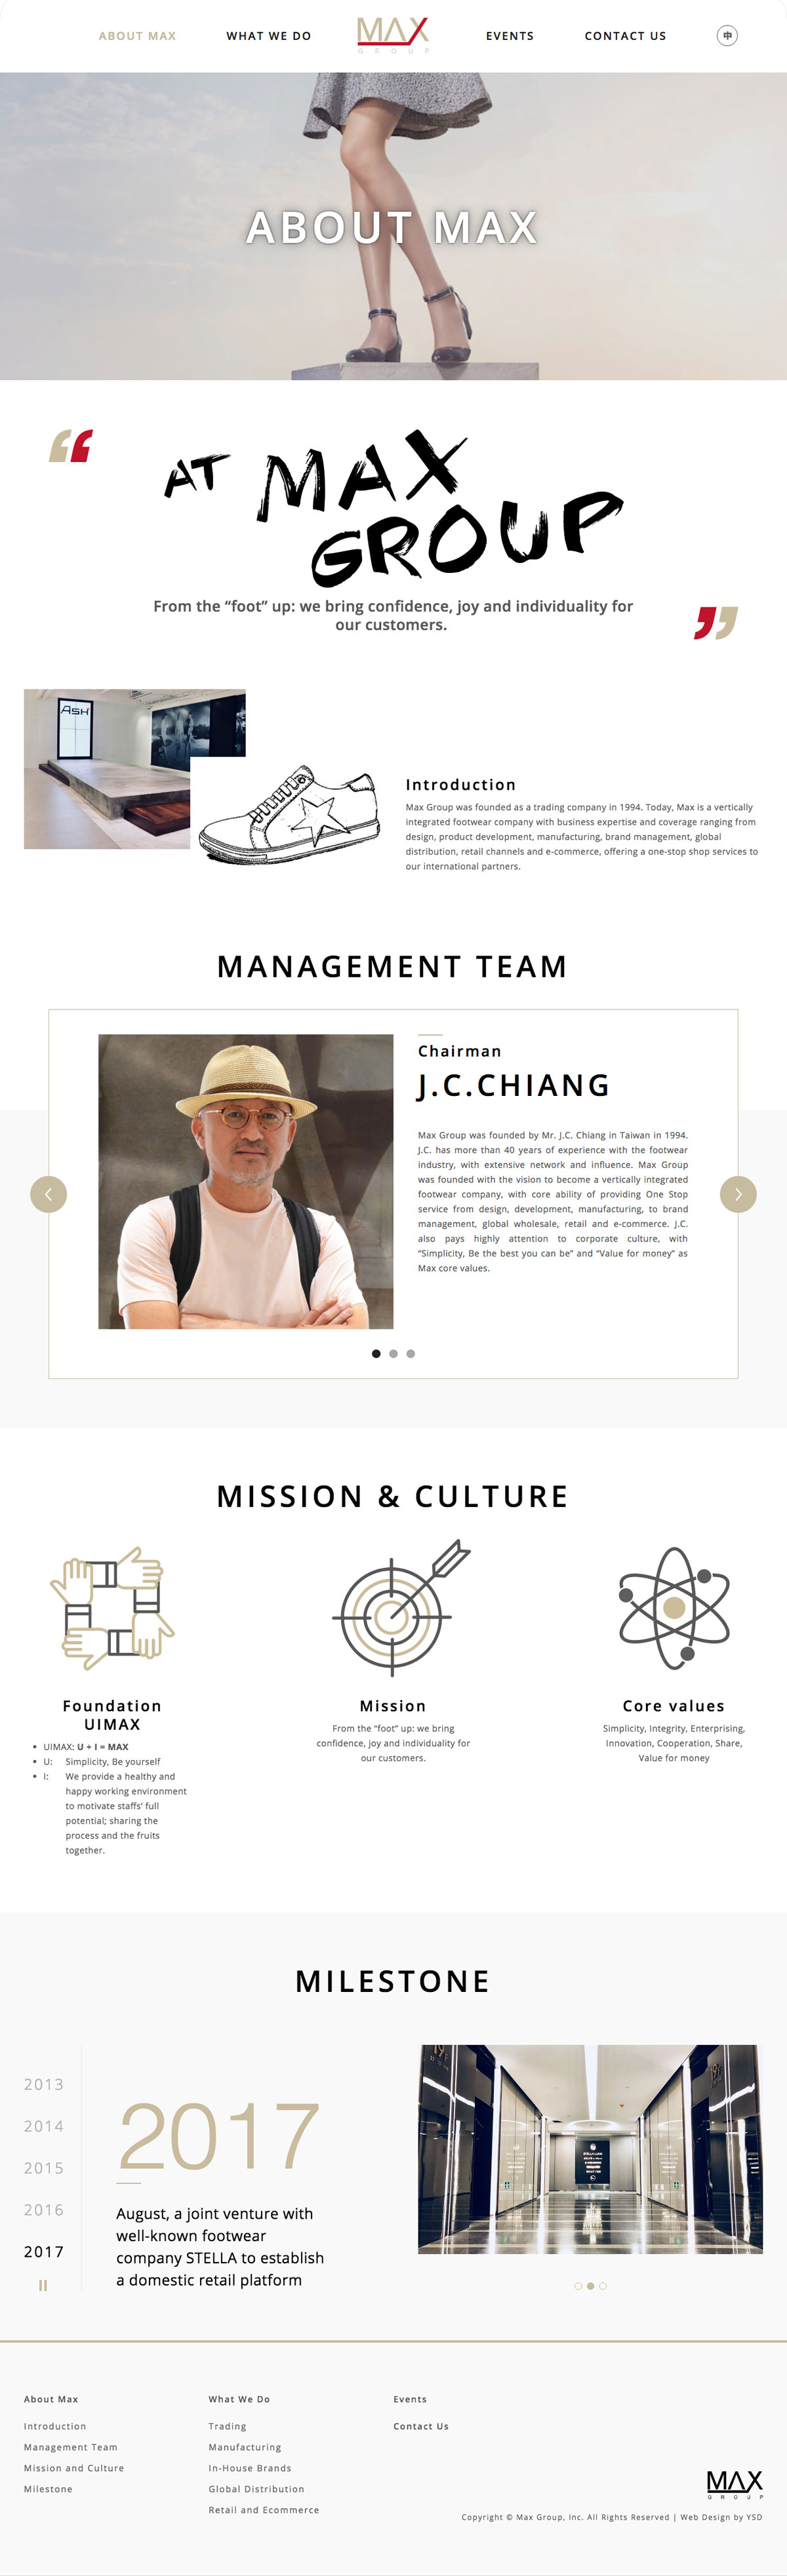 maxgroup-detailpage-3.jpg